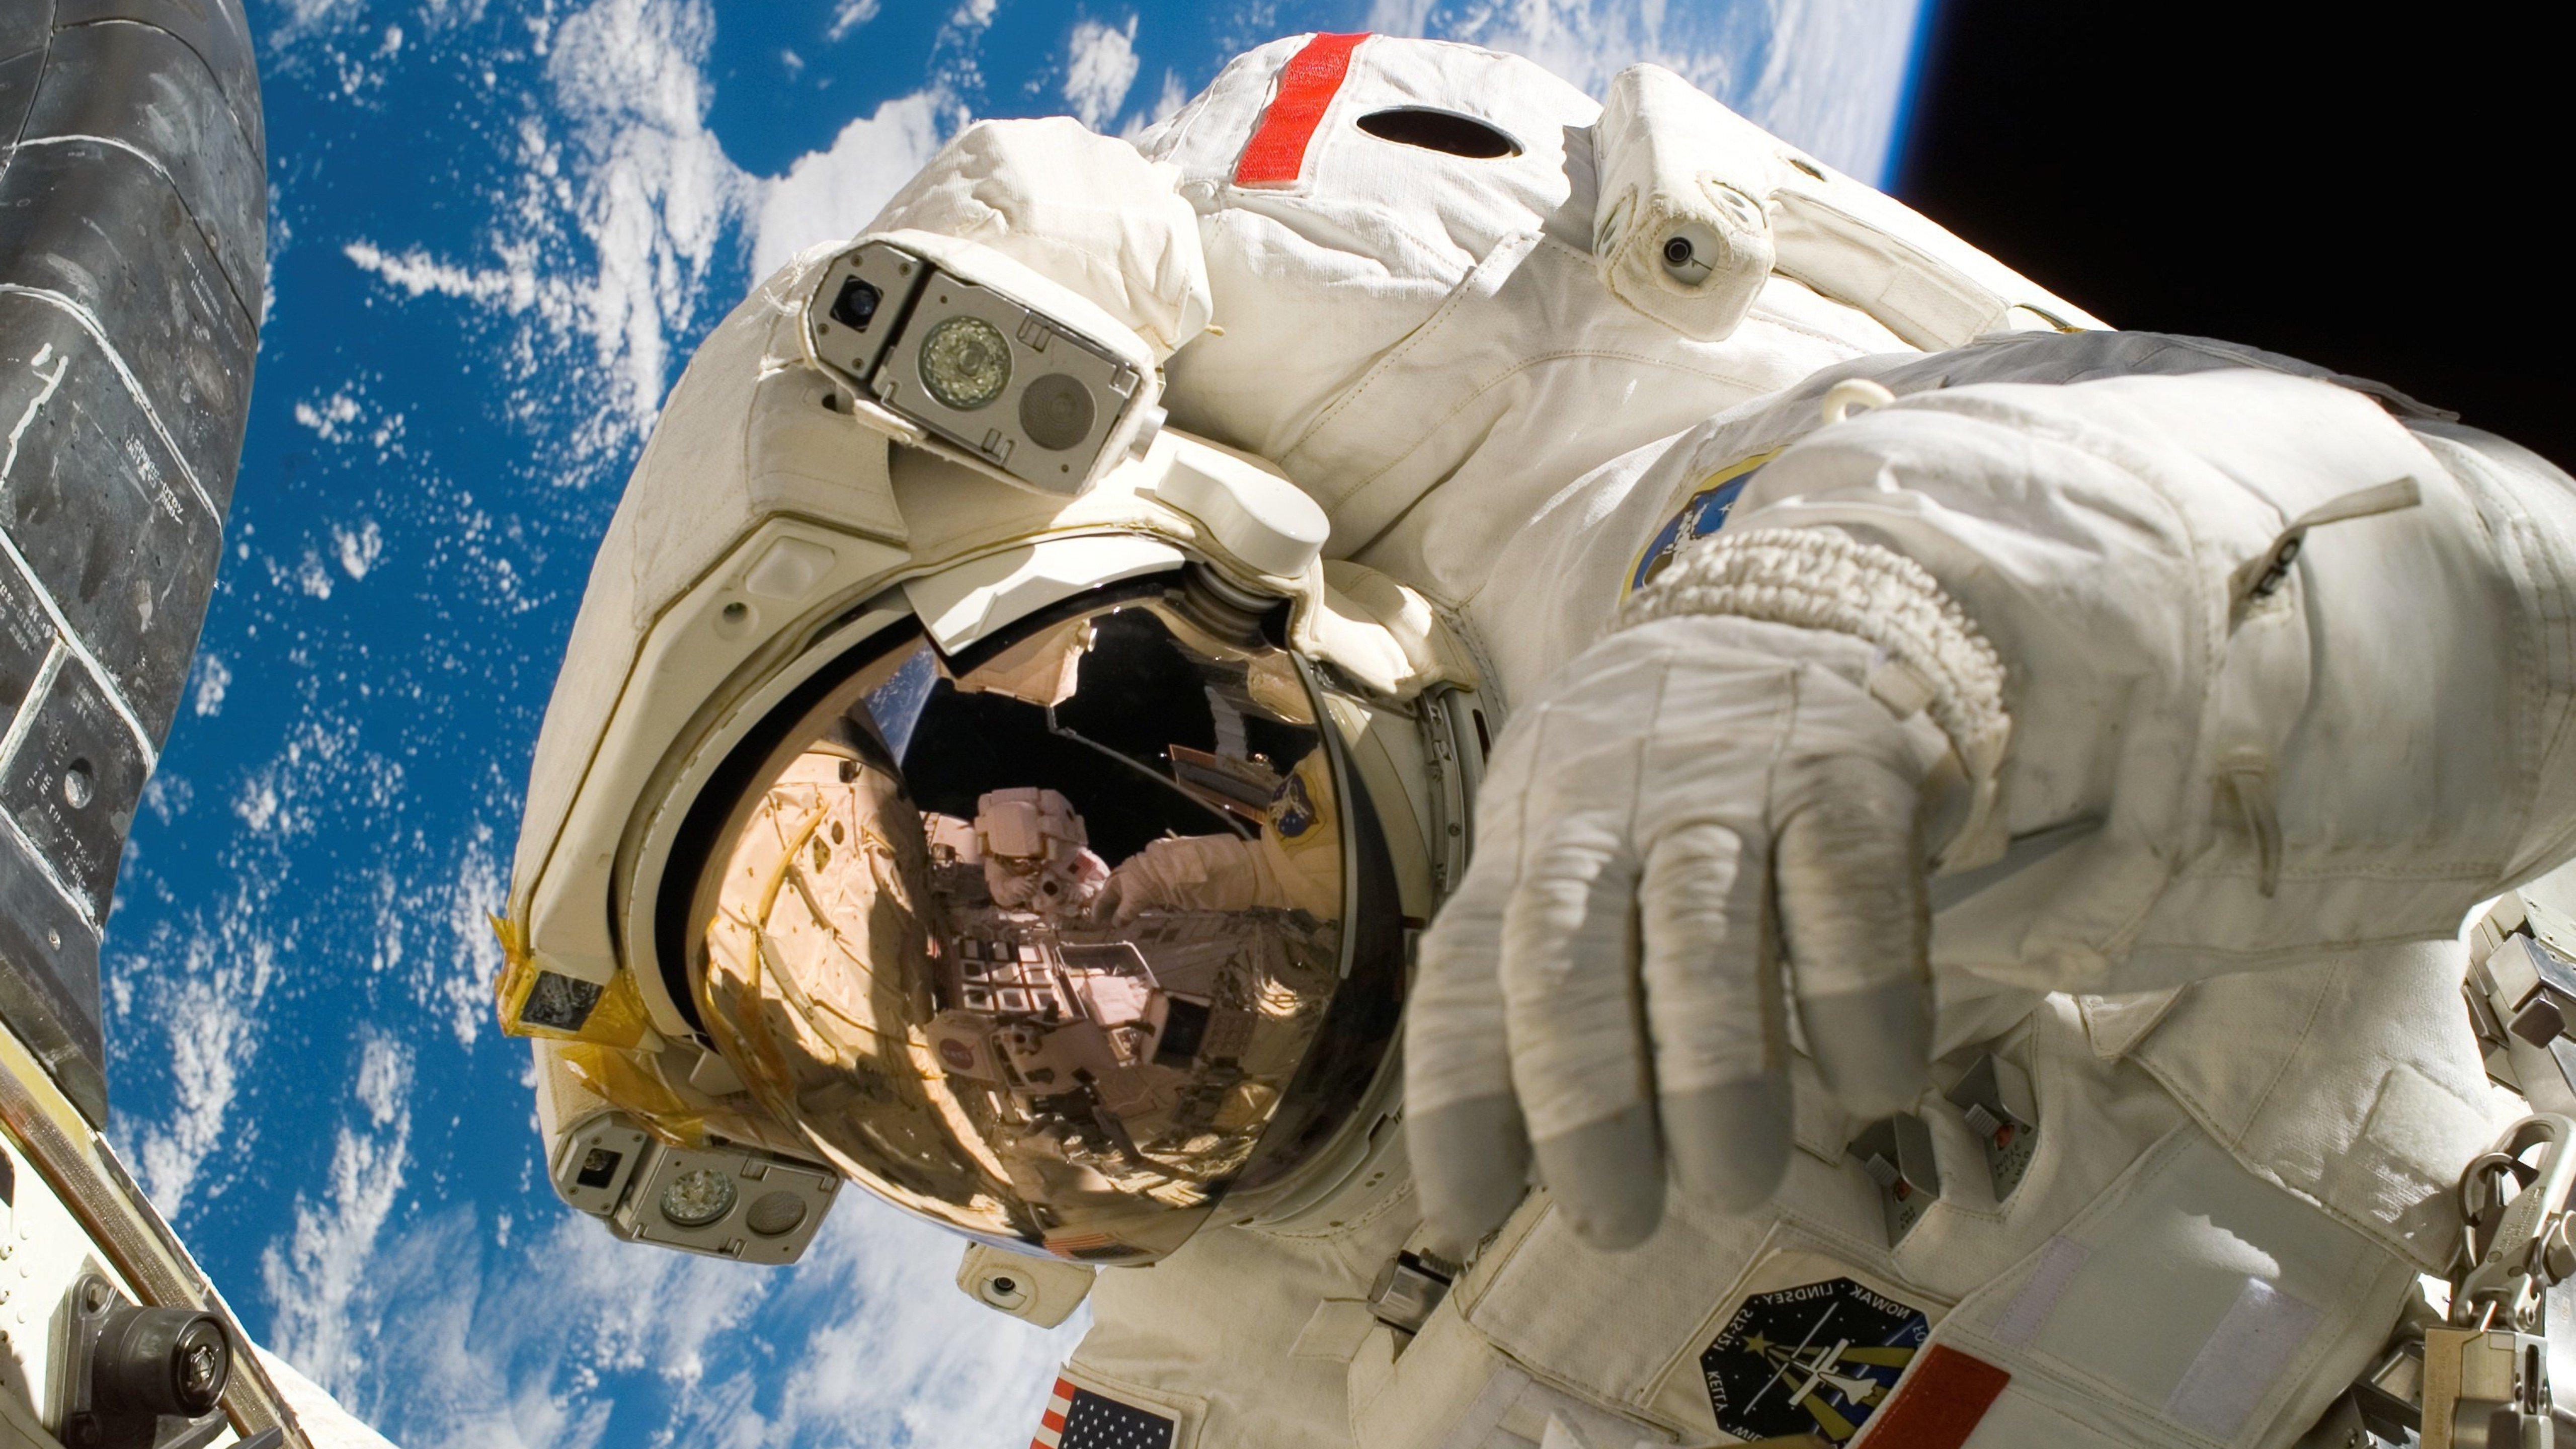 astronaut space iphone wallpaper - photo #35